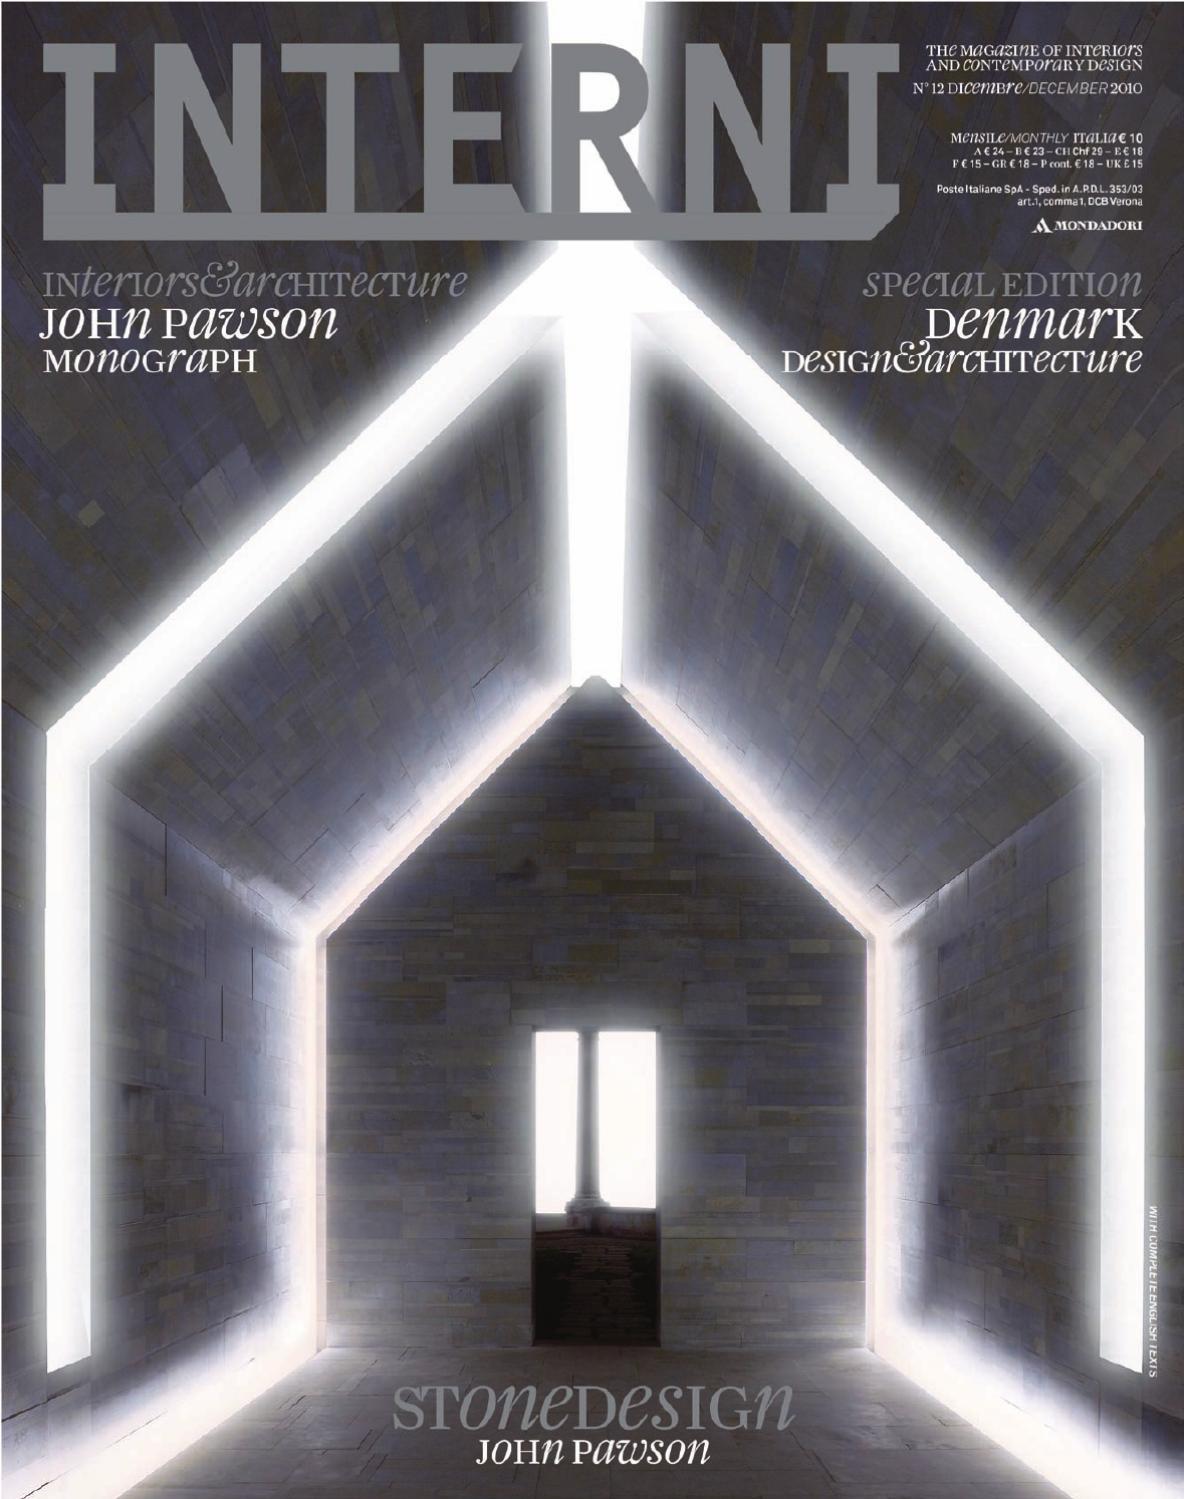 Interni Magazine 612 by Interni Magazine - issuu